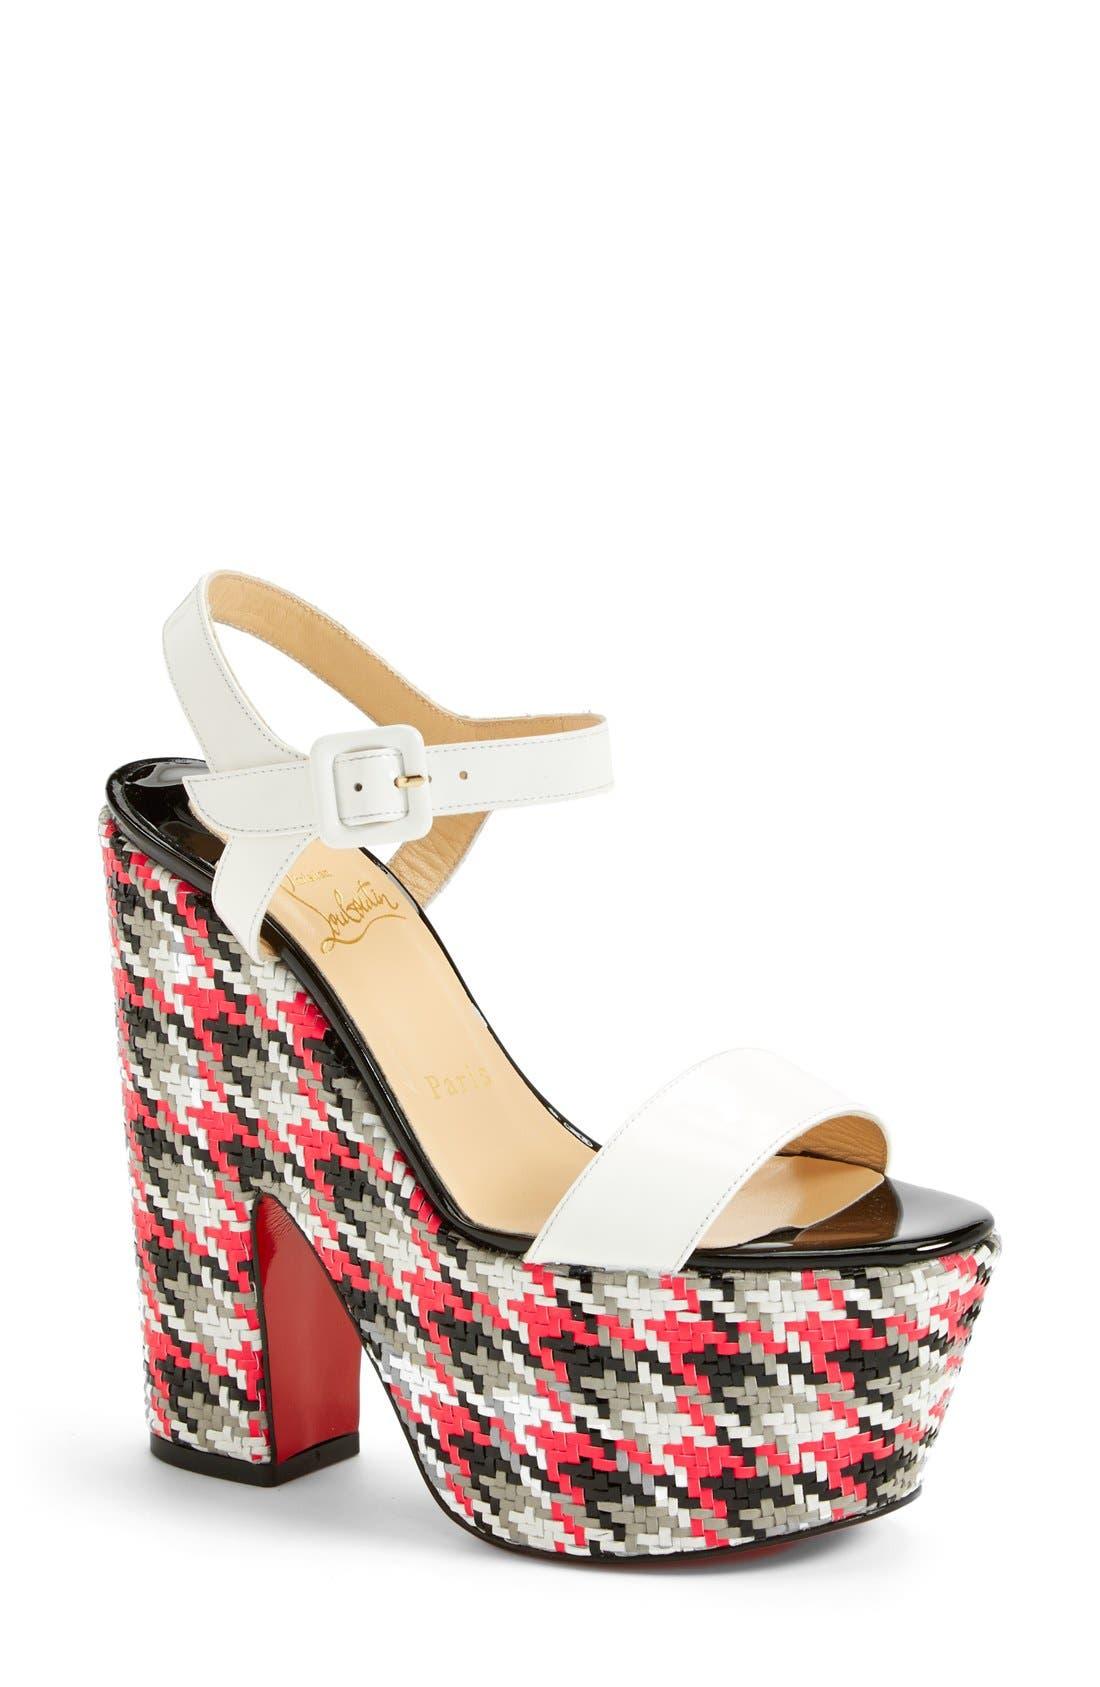 Alternate Image 1 Selected - Christian Louboutin 'Bella' Plaid Platform Sandal